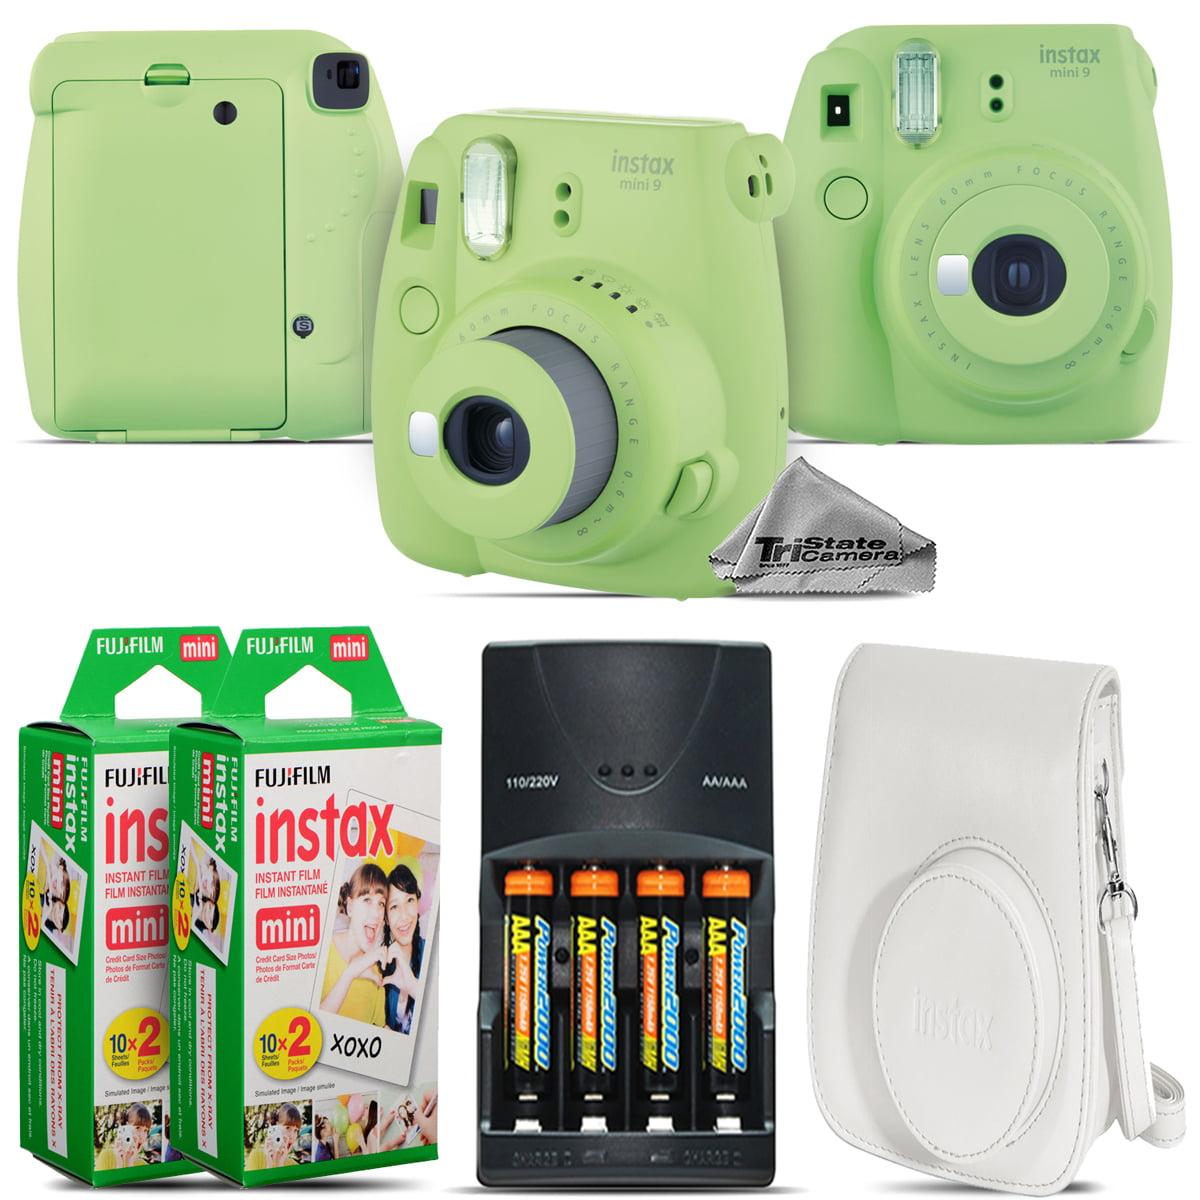 FujiFilm mini 9 Camera (Lime Green) + 4 Batteries + White Case 40 Films Kit by Tri State Camera